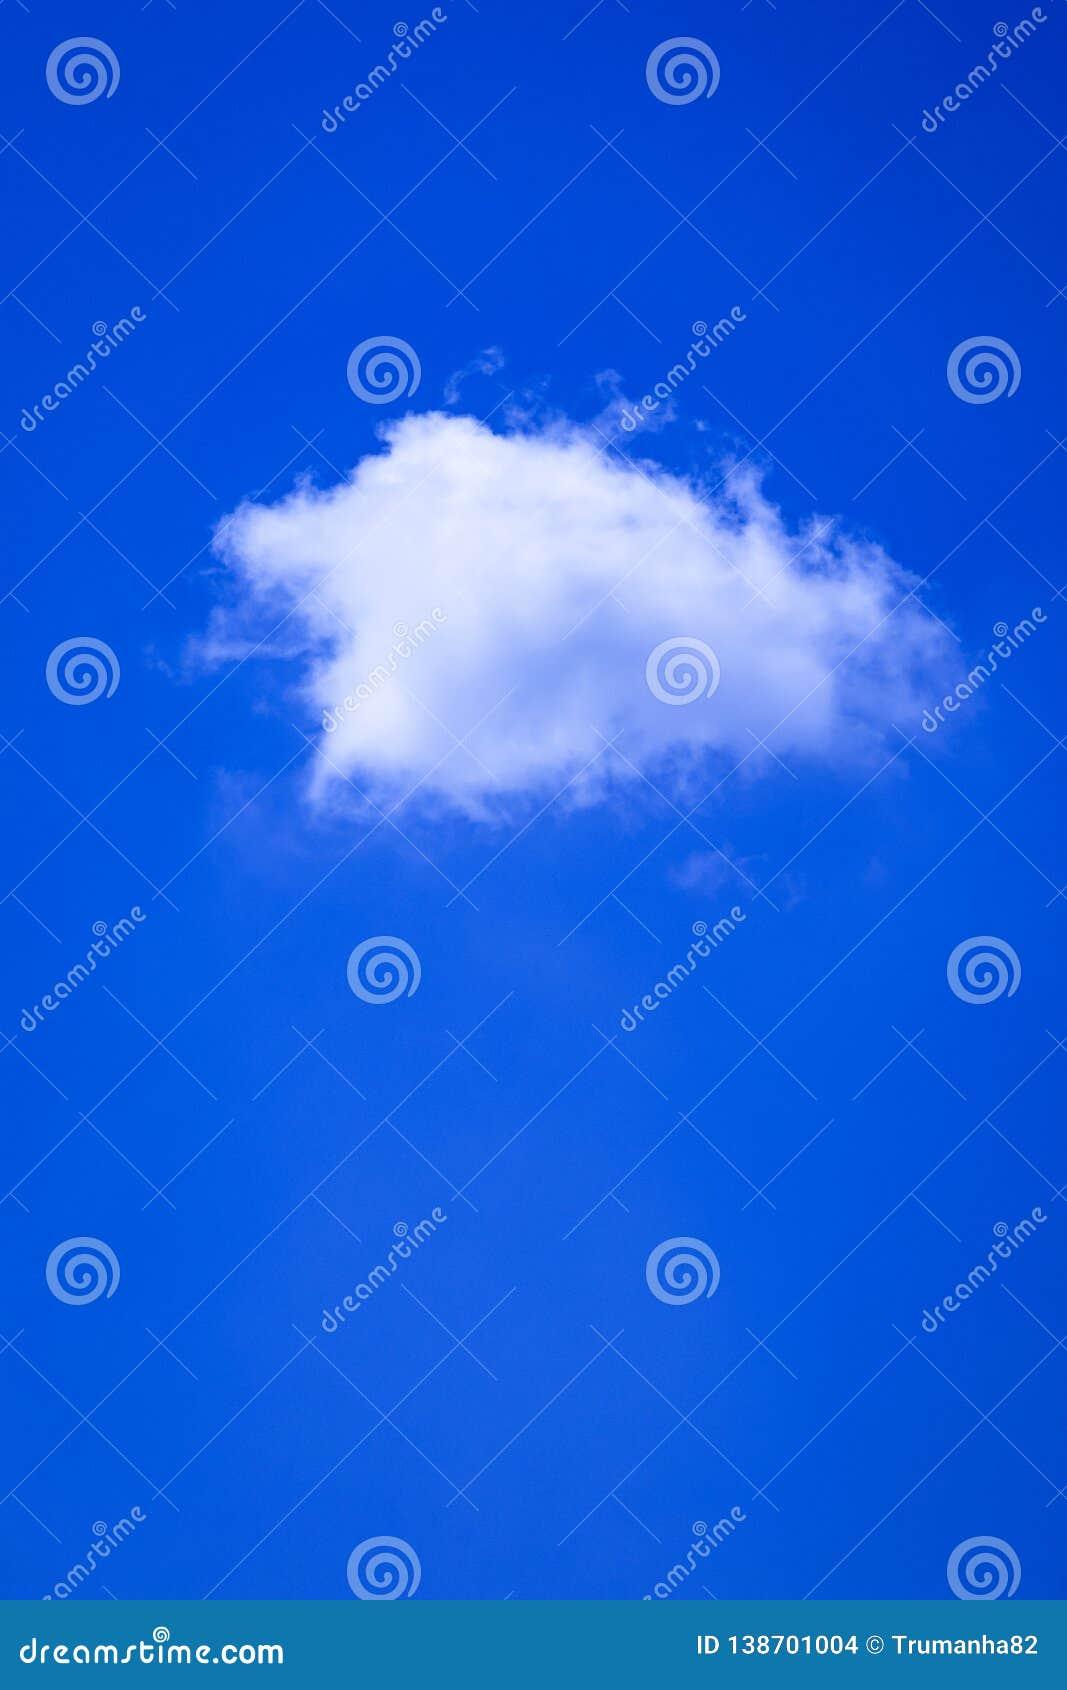 One White Cloud in Blue Sky